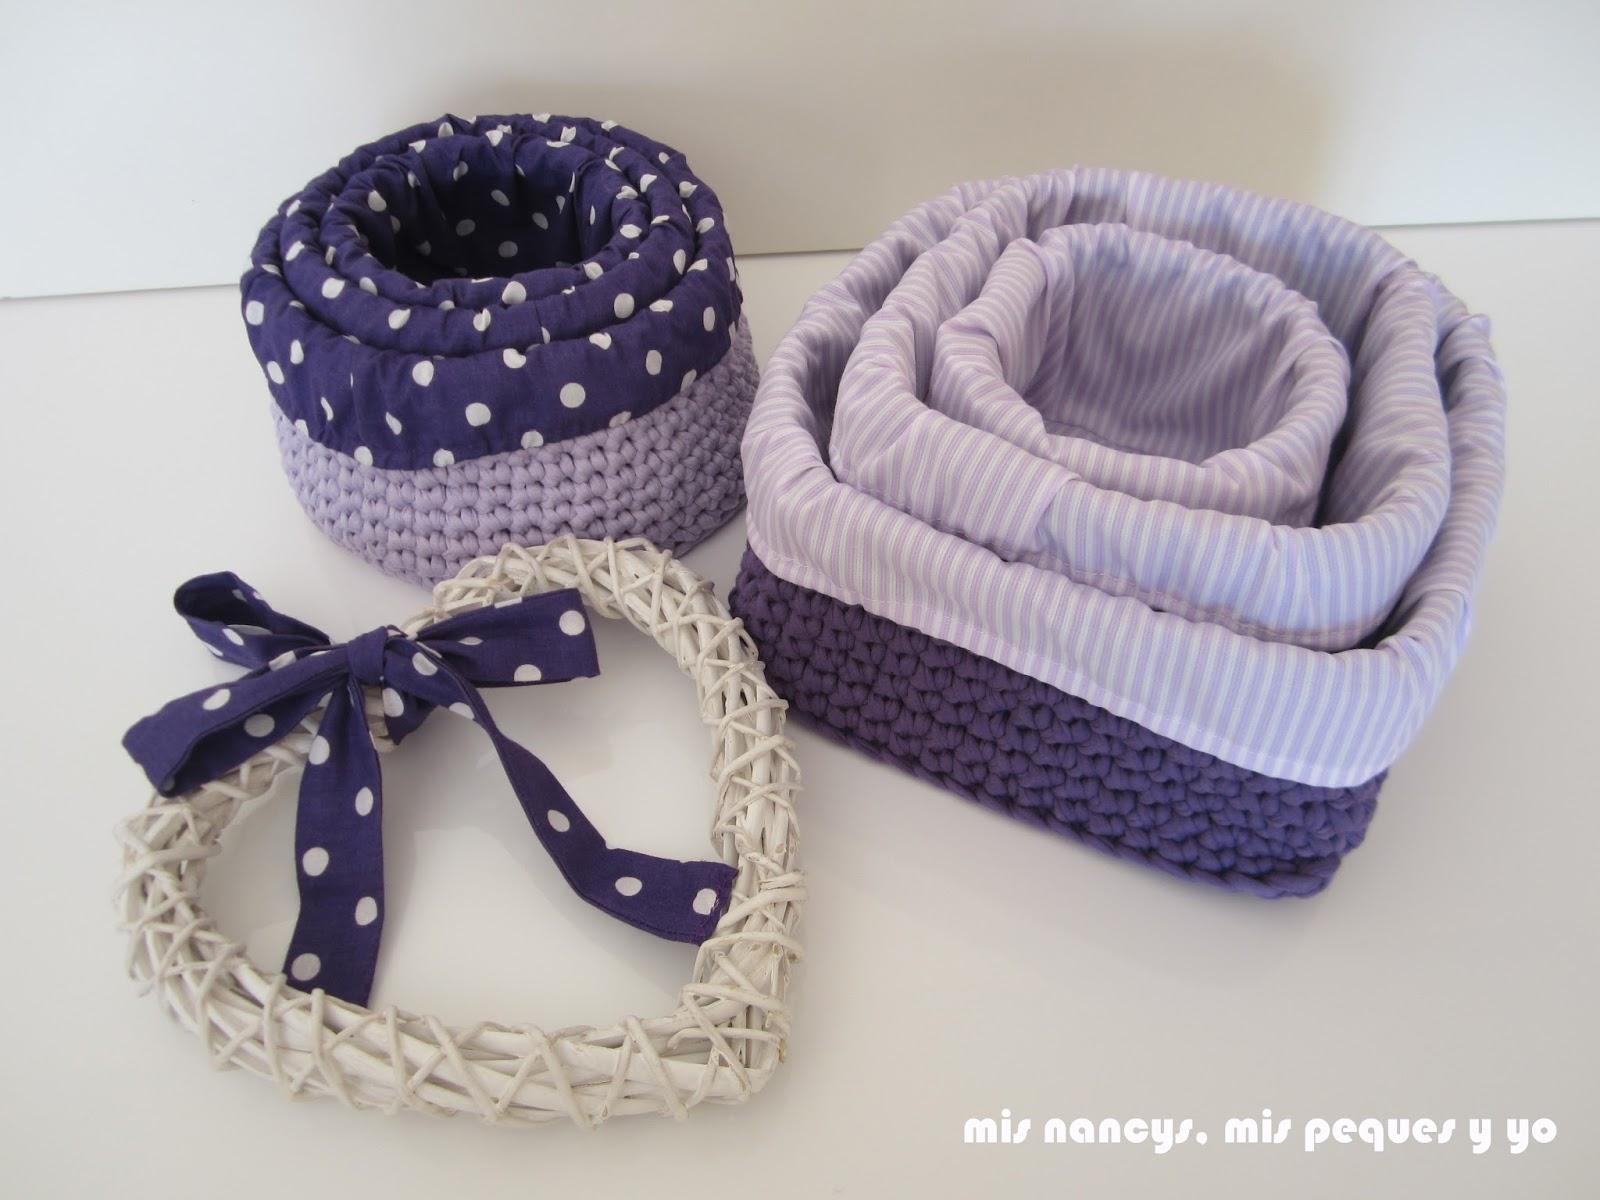 Tutorial diy fundas de tela para cestas cuadradas de trapillo - Cestas de trapillo ...